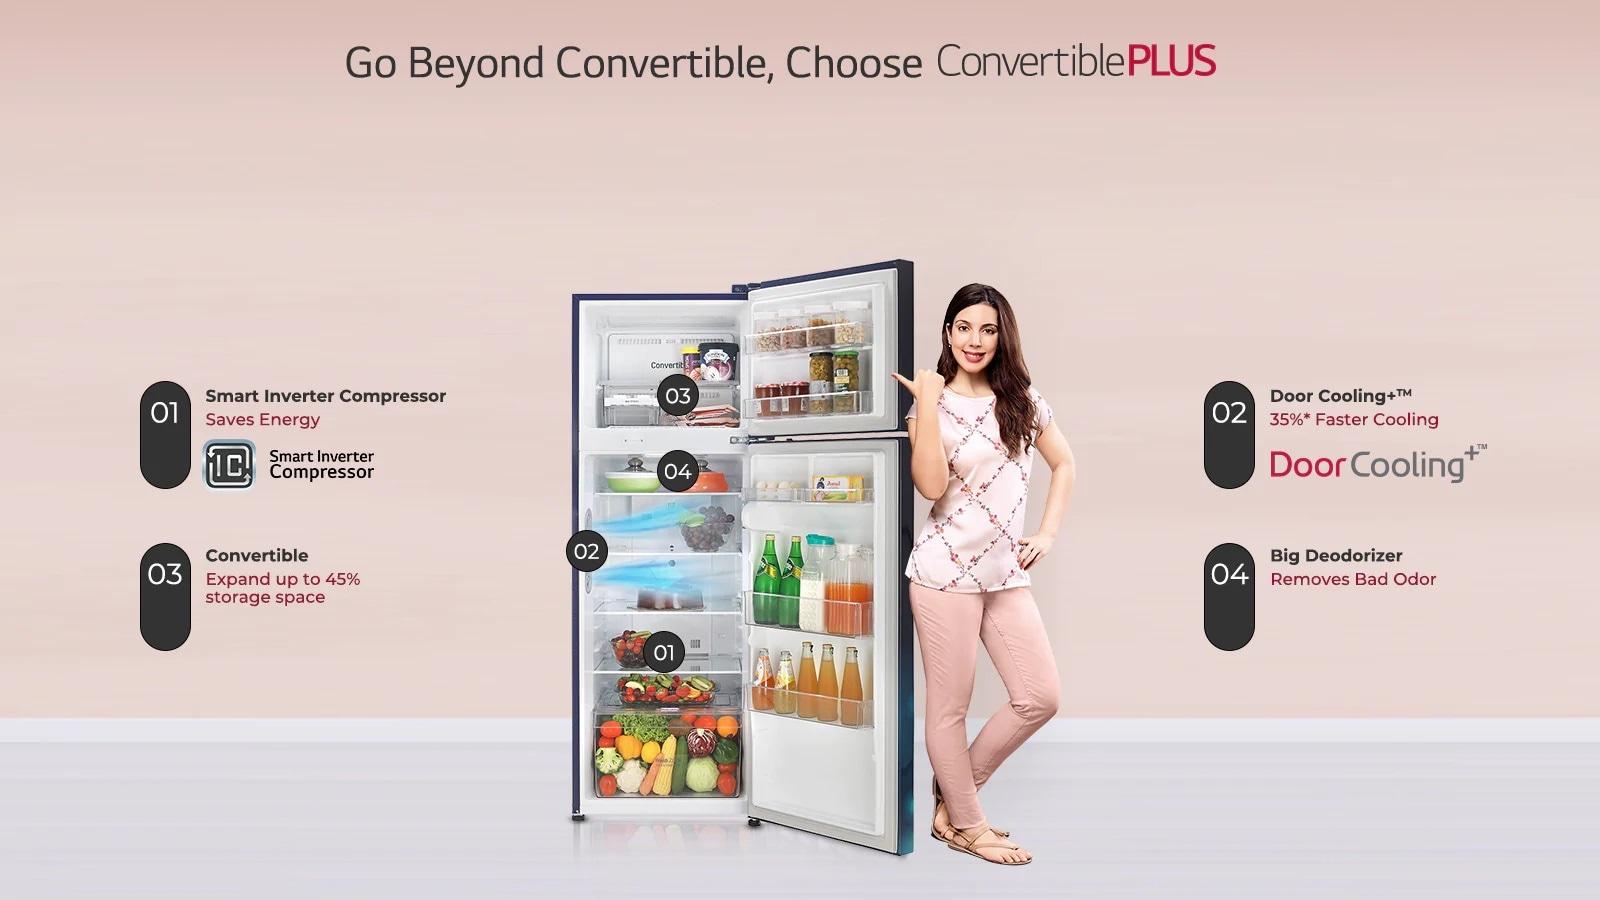 LG GL-T292RBCX Convertible Plus